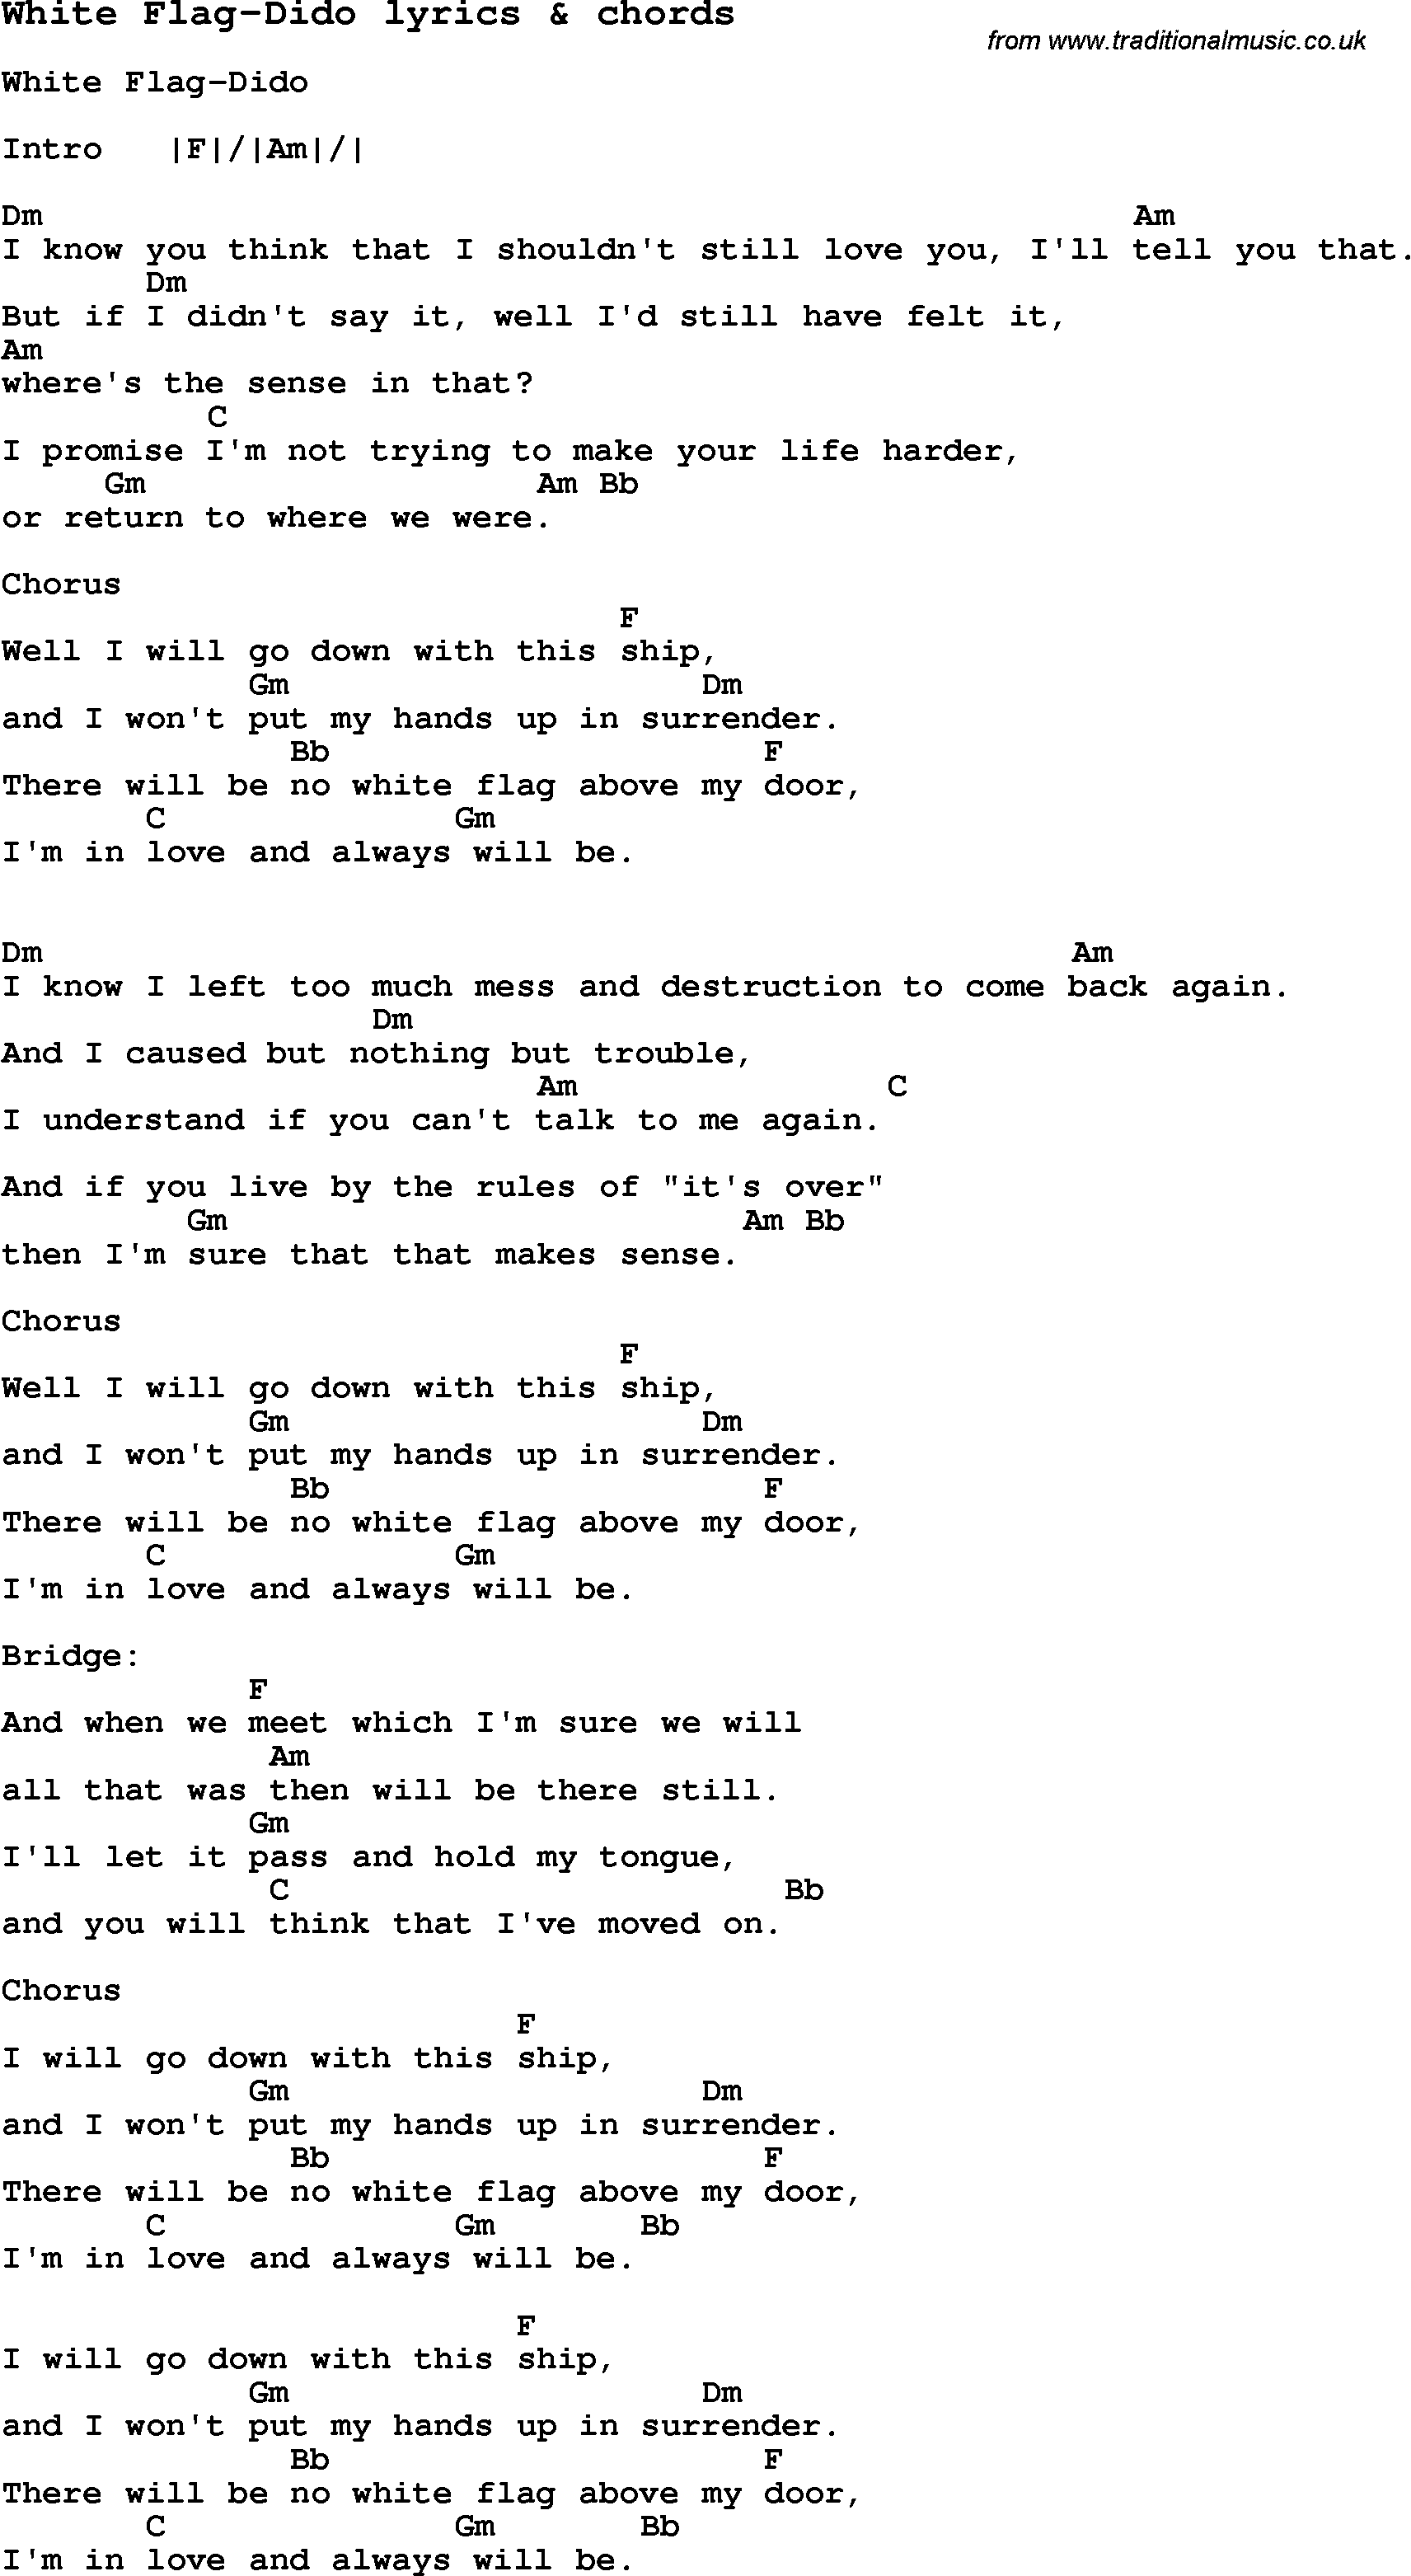 Love Song Lyrics For White Flag Dido With Chords For Ukulele